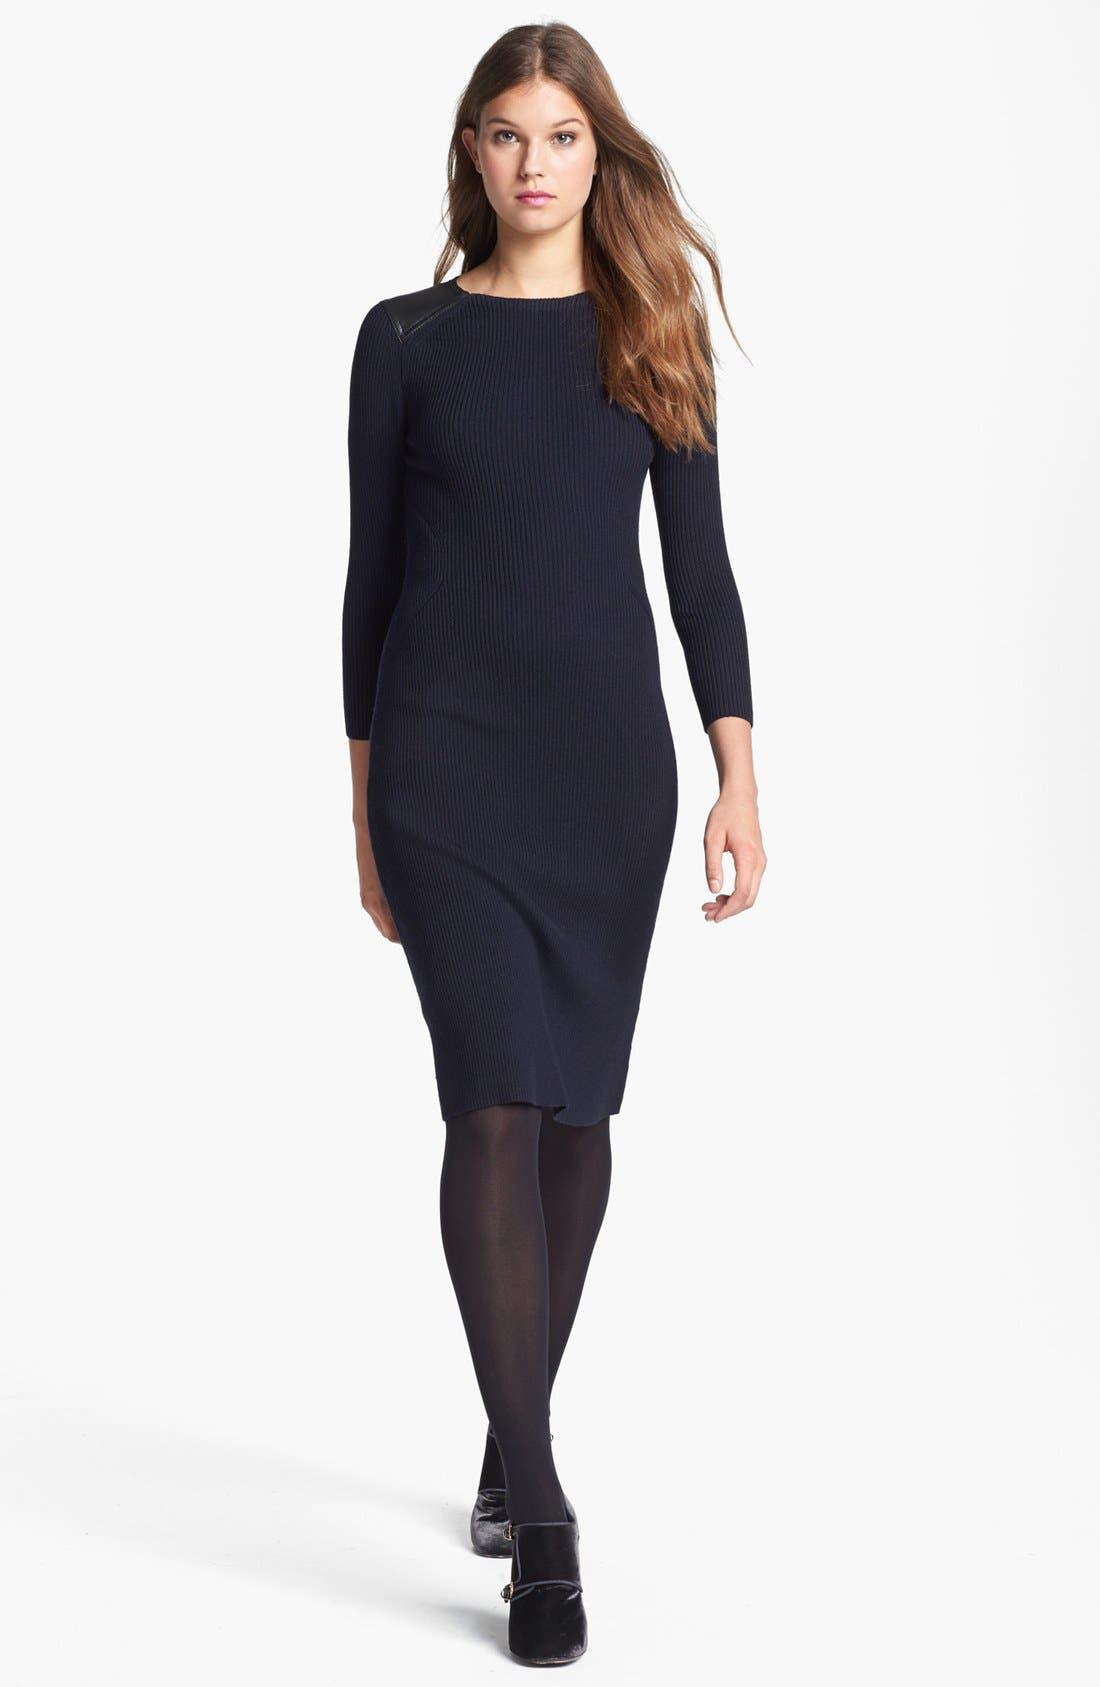 Main Image - Tory Burch 'Courtney' Merino Wool Blend Sweater Dress